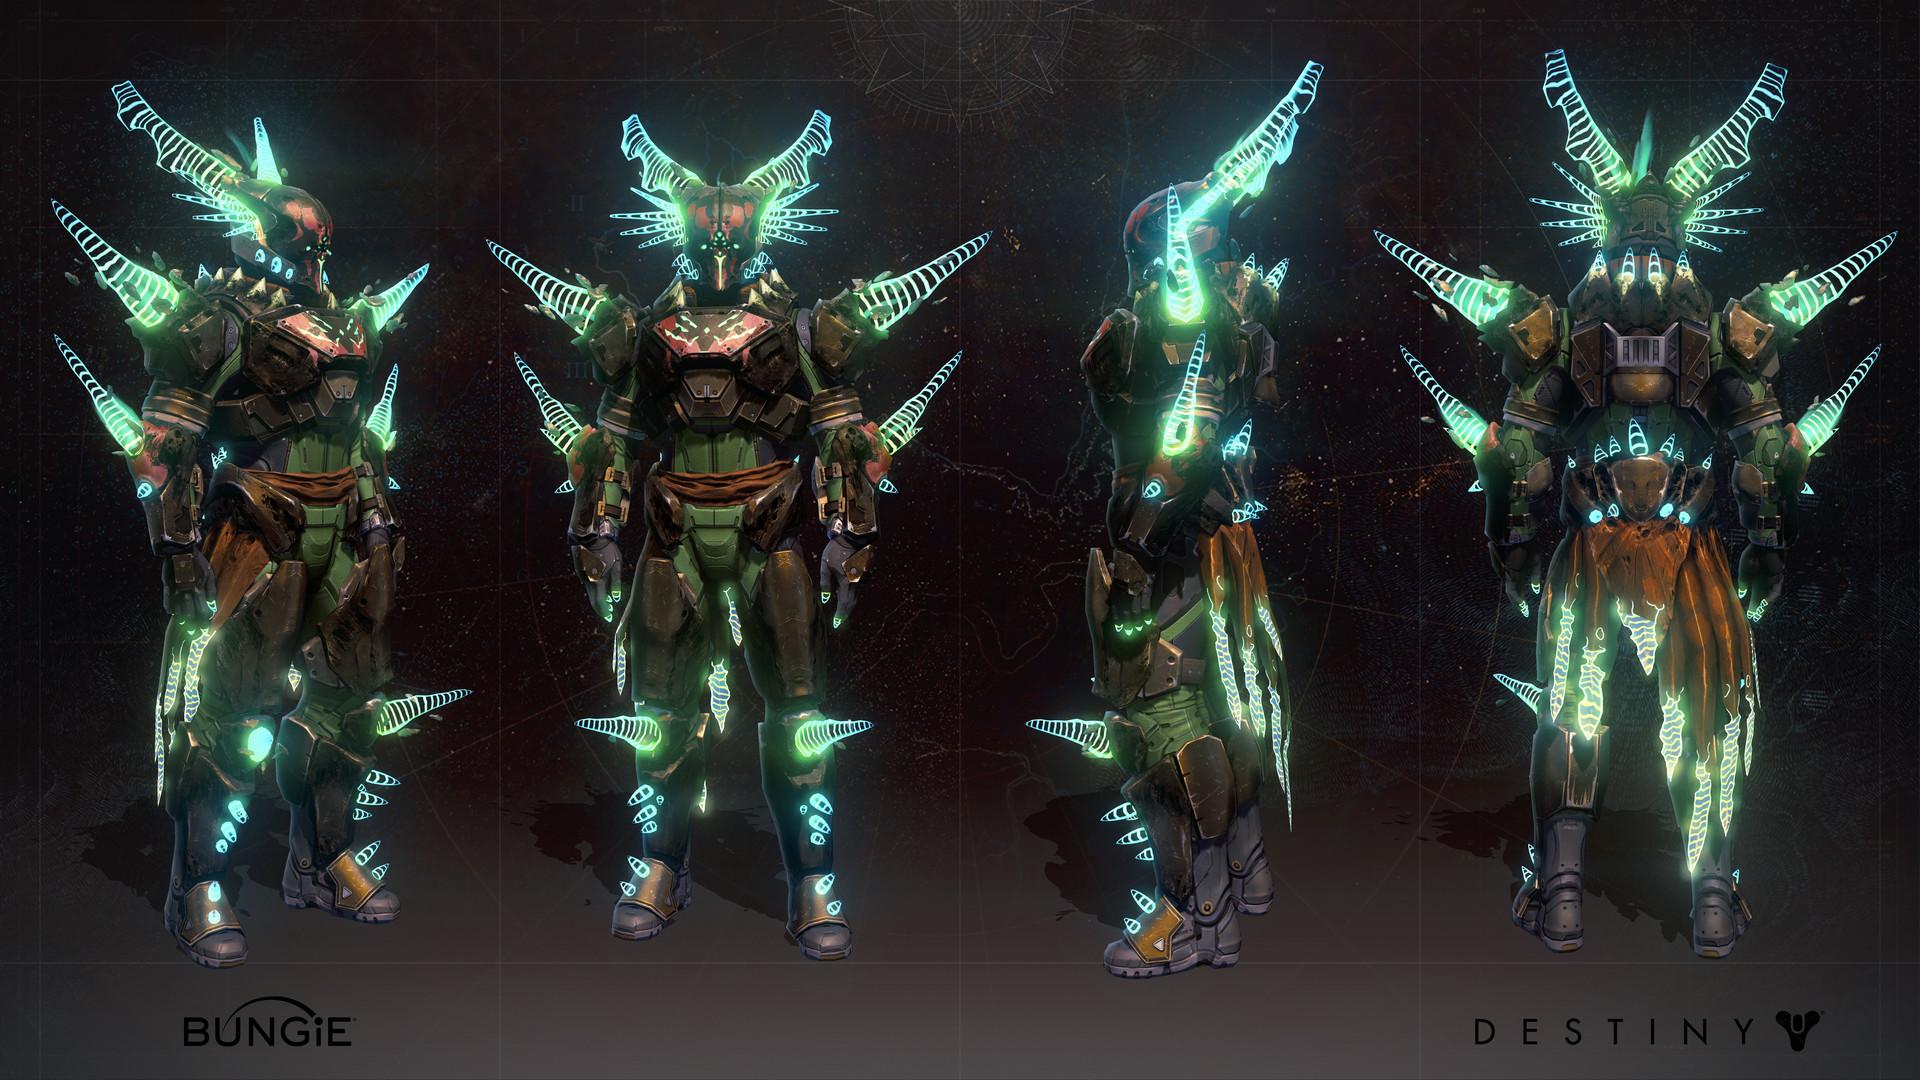 Destiny 2 Kings Fall Wallpaper Artstation Destiny Age Of Triumph Titan Willbreaker